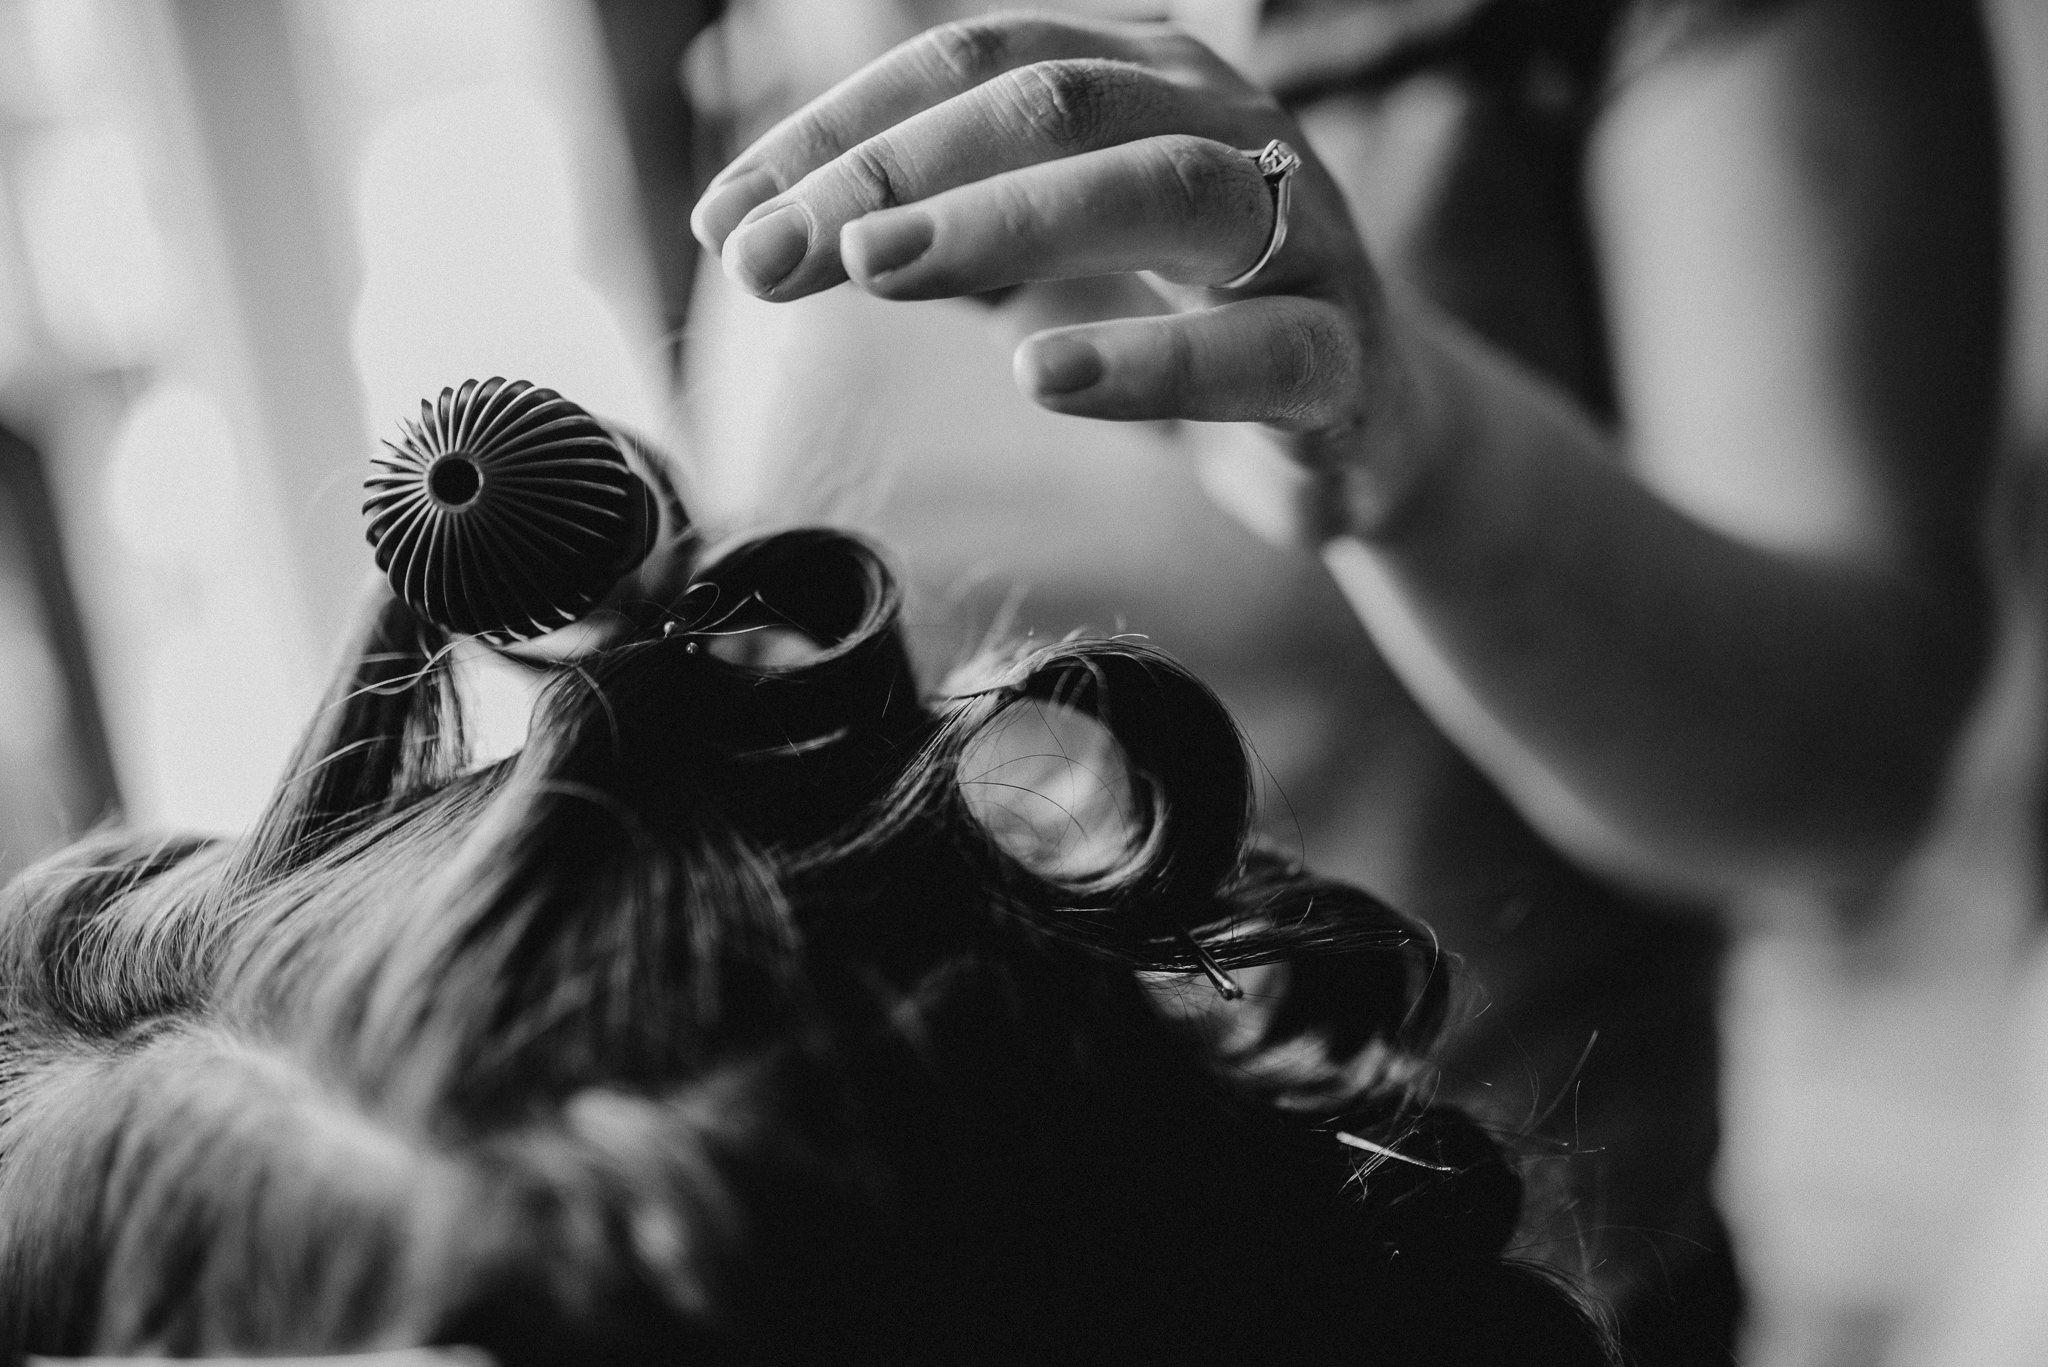 documentary-wedding-photographer-leeds-4.jpg